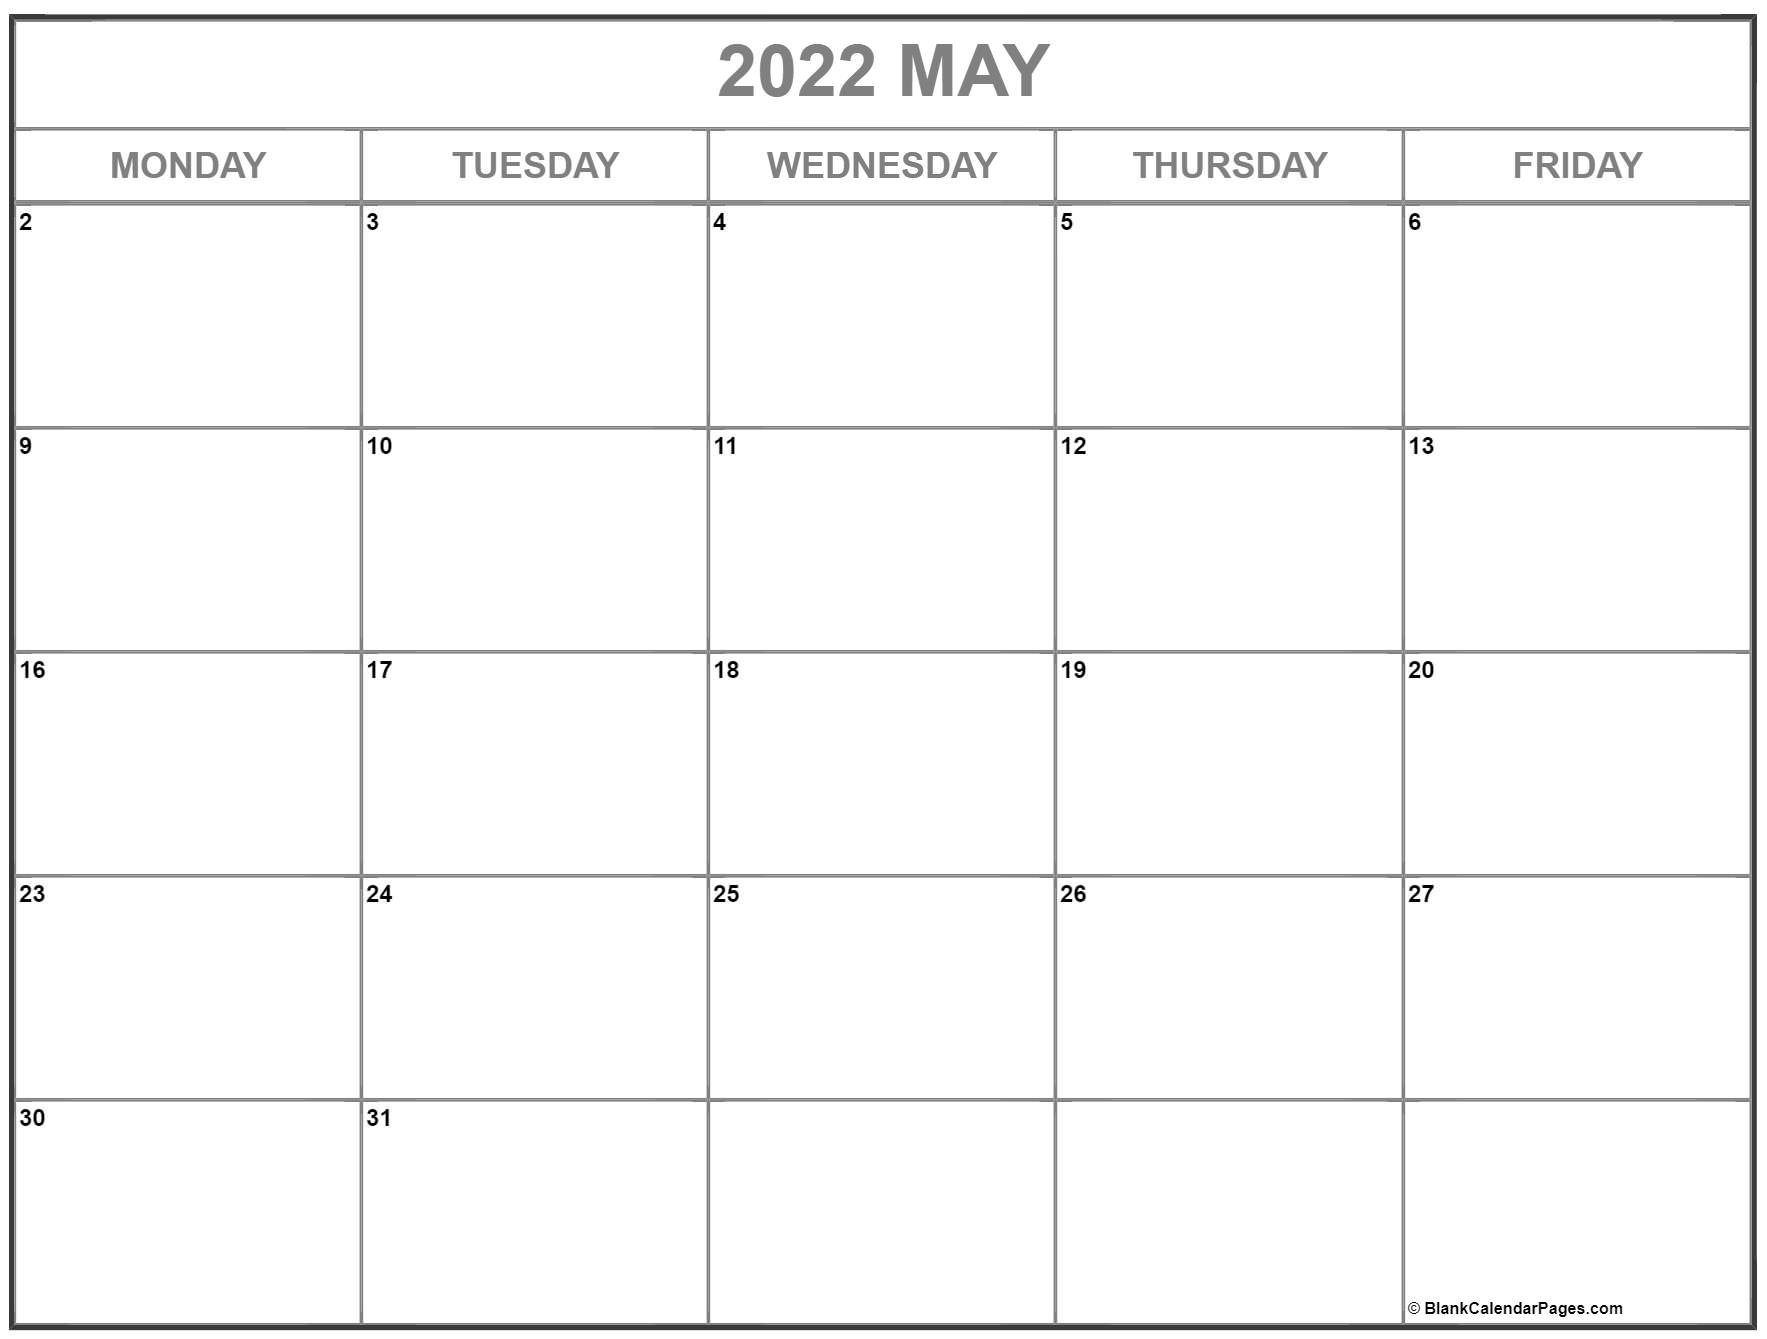 May 2022 Monday Calendar | Monday To Sunday Monday Thru Friday Printable Calendar Free